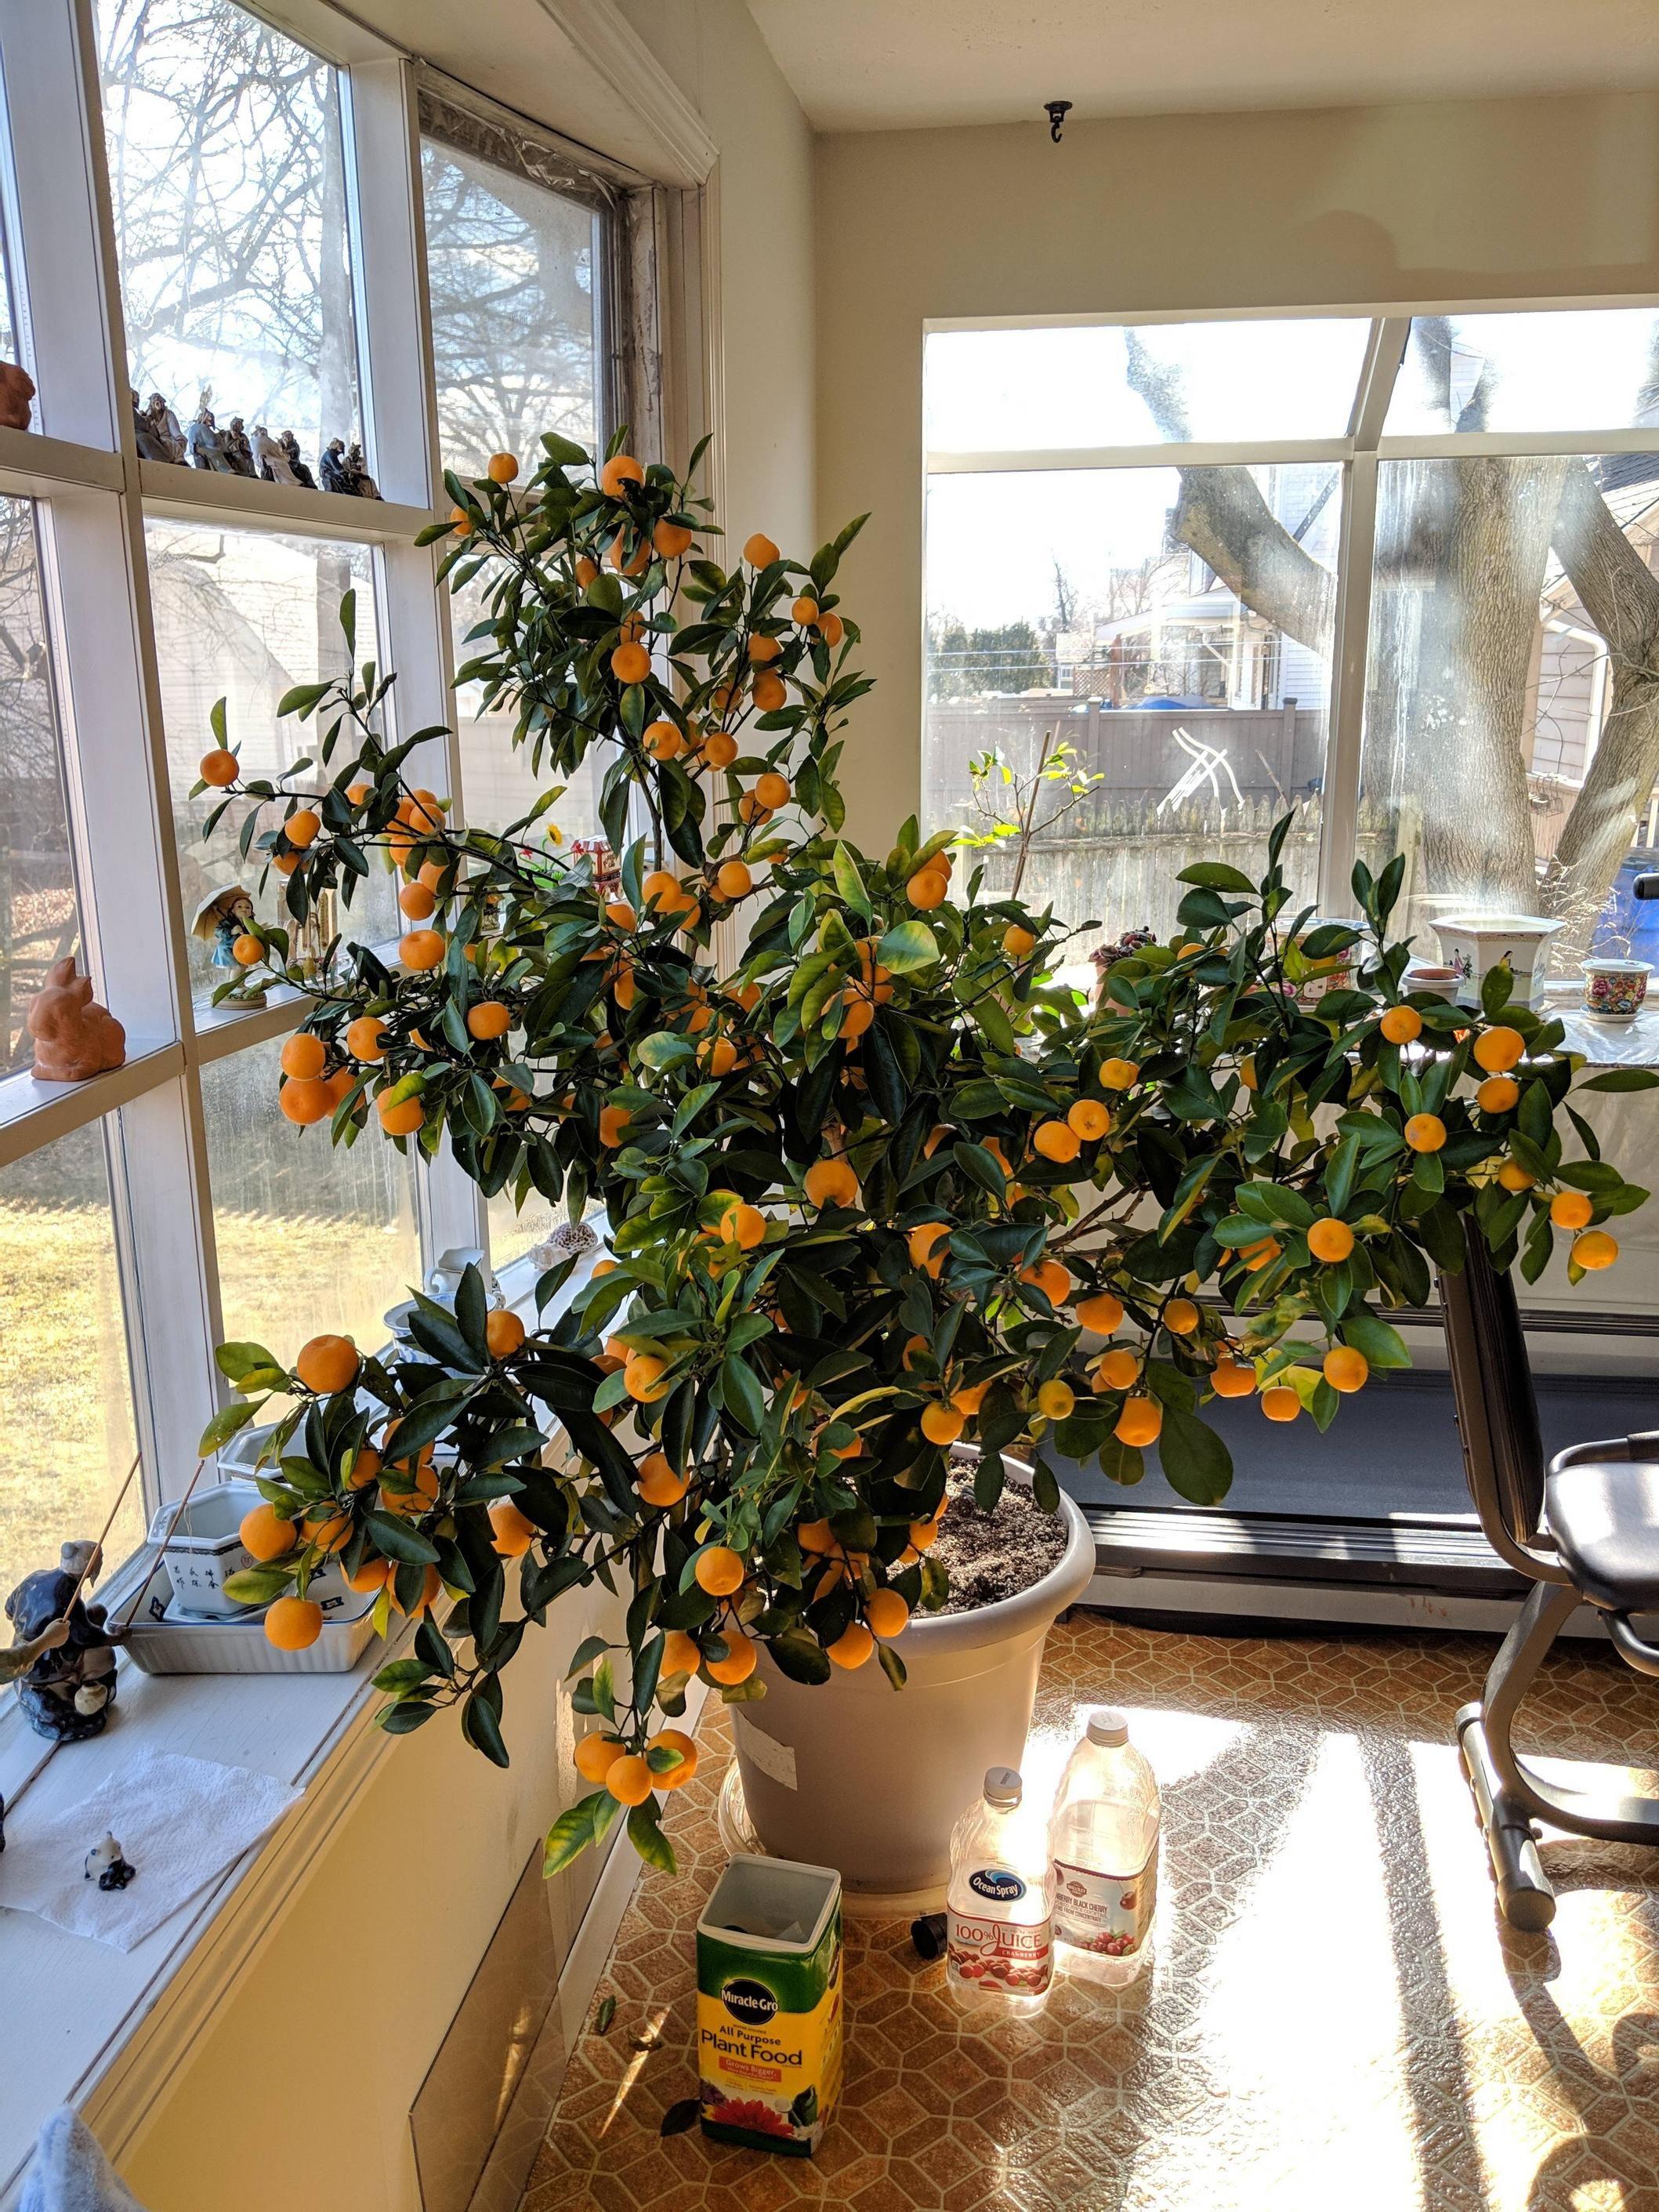 My Grandma S Prized Calamondin Orange Tree I M Inheriting She